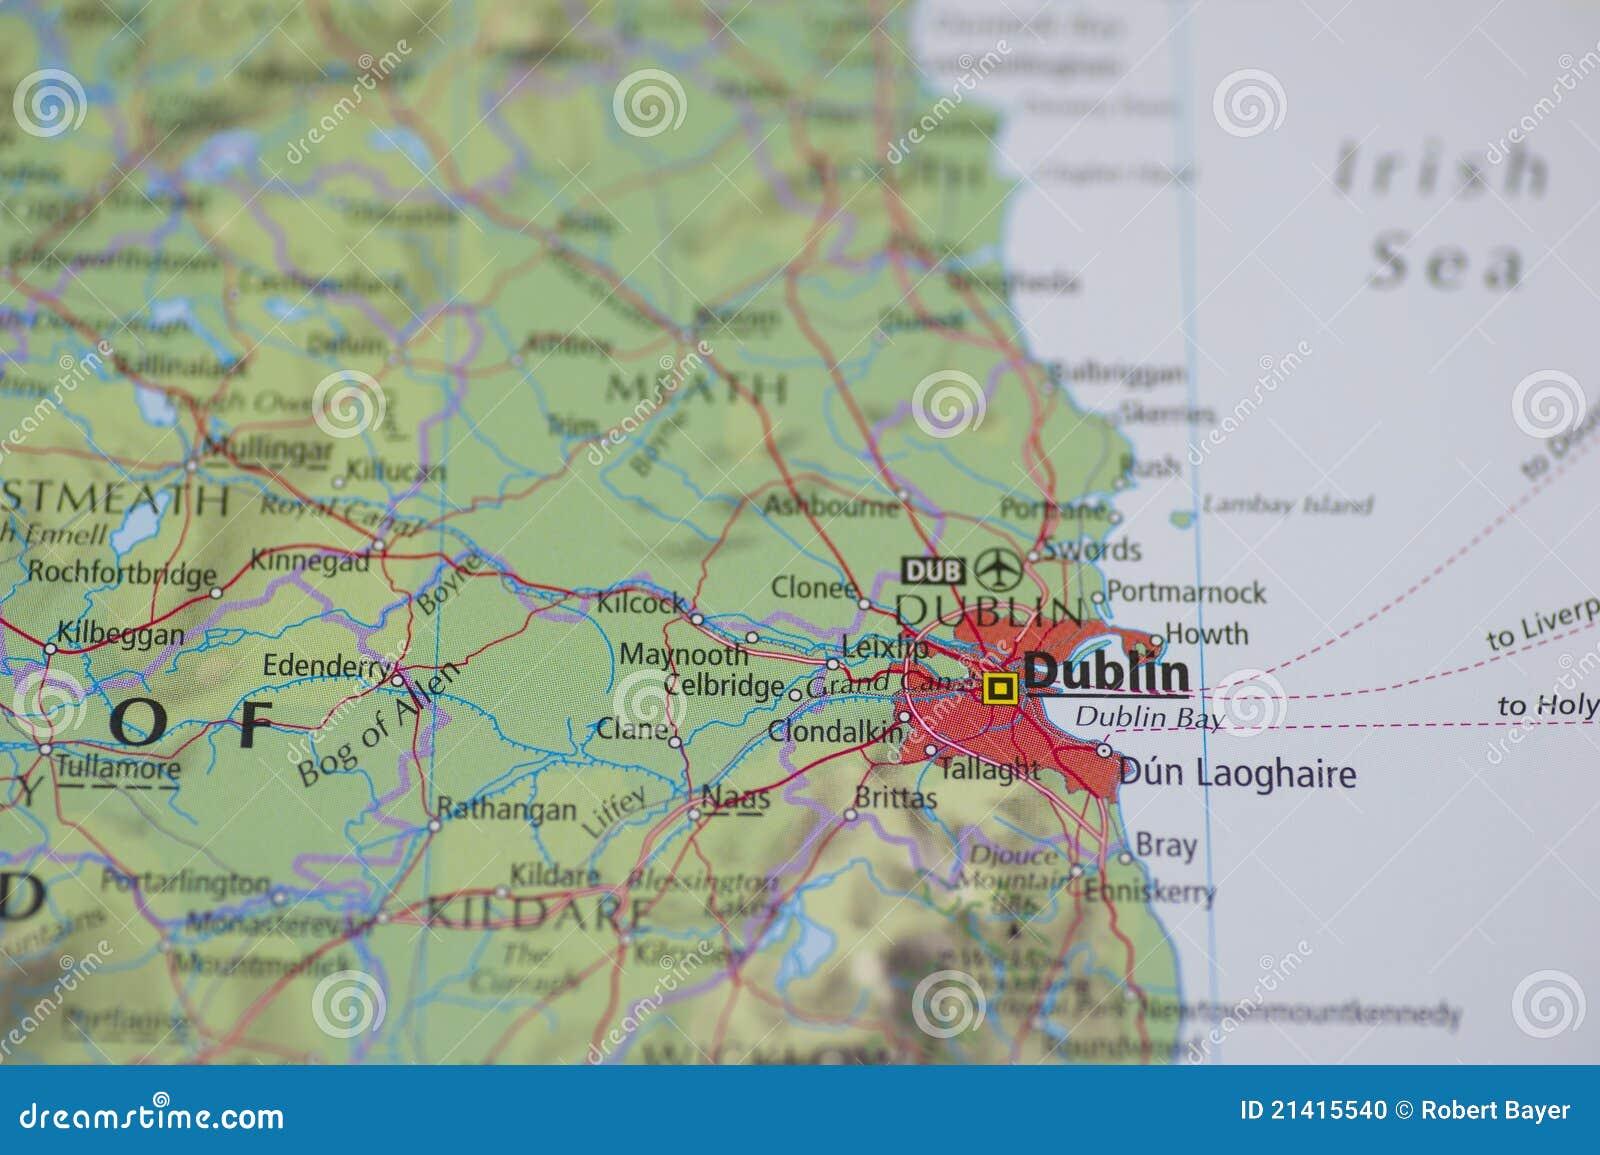 Map Of Dublin Ireland And Surrounding Area.Atlas Map Dublin Stock Photo Image Of Destination Direction 21415540